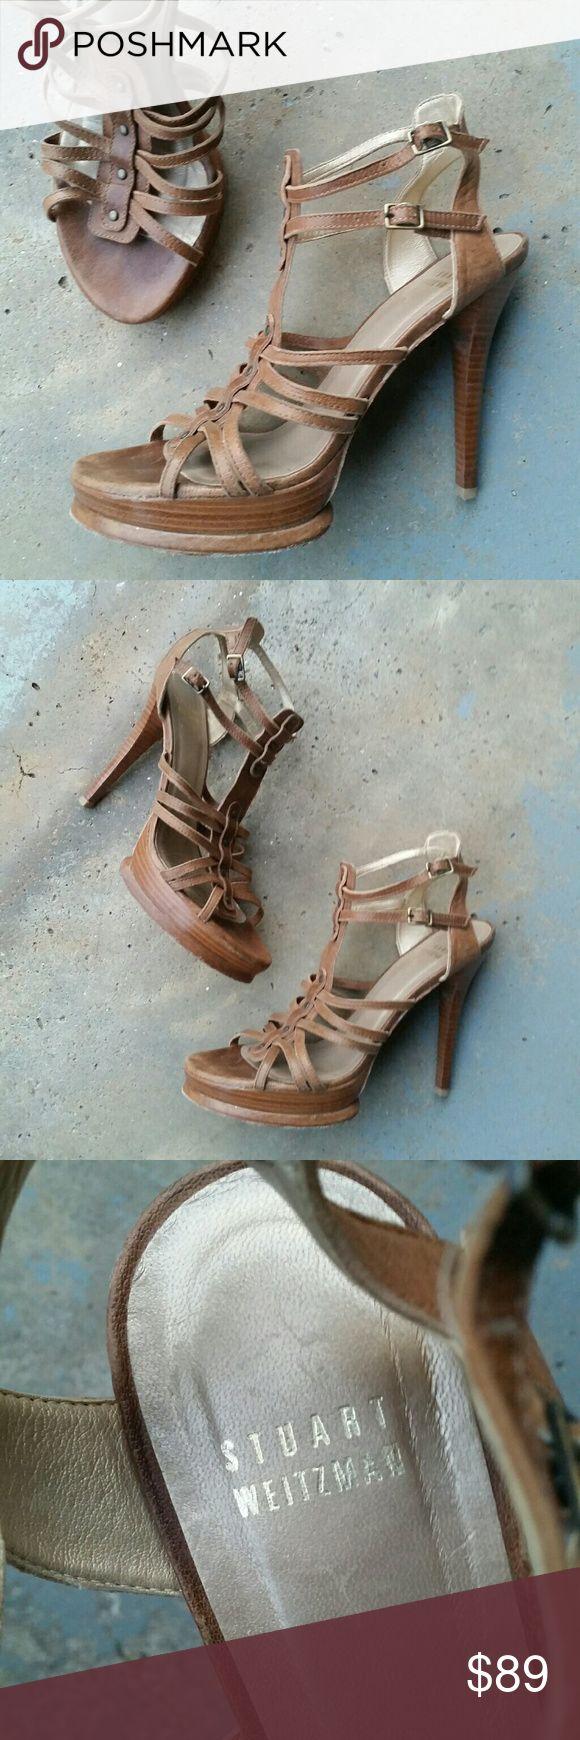 "Stuart Weitzman Leather Brown Strappy High Heels Stuart Weitzman Brown Leather Strappy High Heels. Platform wood soul. 2 buckle closure.  Women's size 7.5. Great condition!  4.5"" heel height. Stuart Weitzman Shoes Heels"